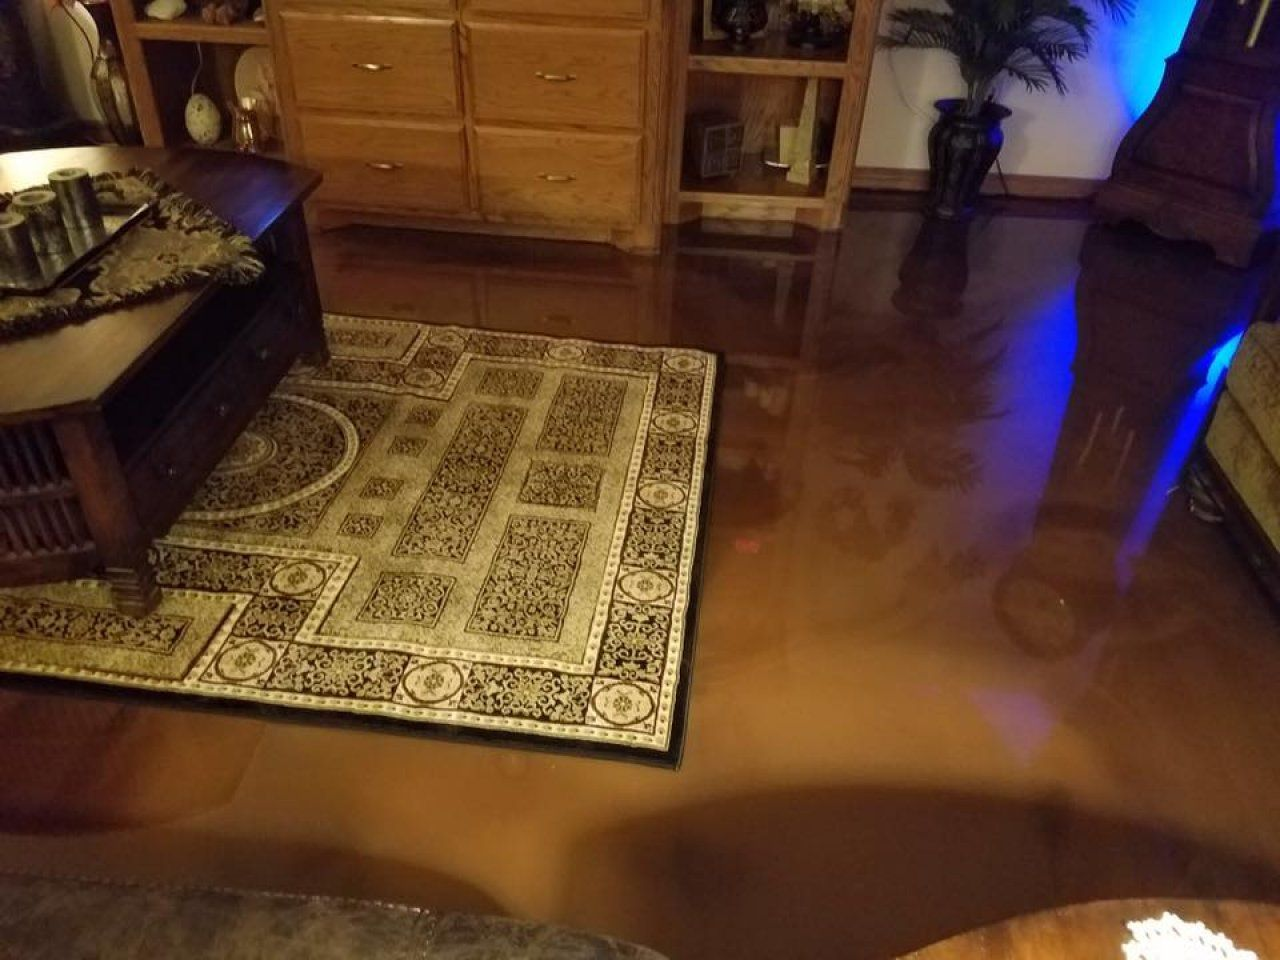 Scratch Resistant Metallic Epoxy In Living Area In Oklahoma City - Flooring contractors okc